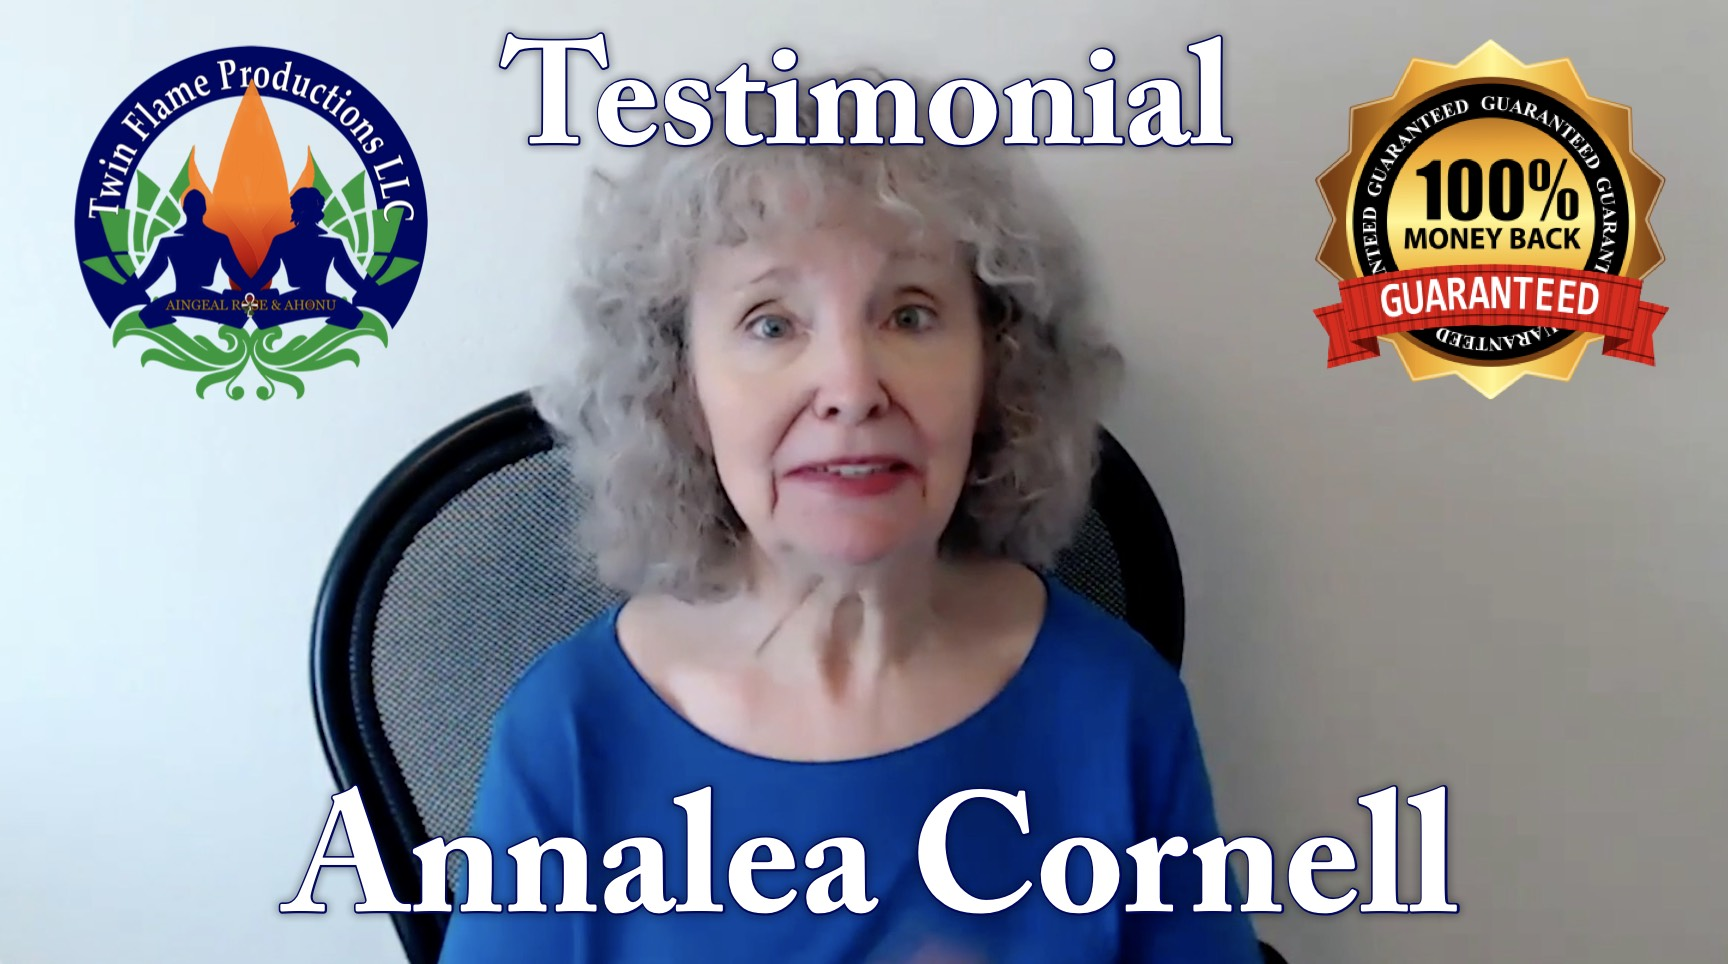 Testimonial from Annalea Cornell